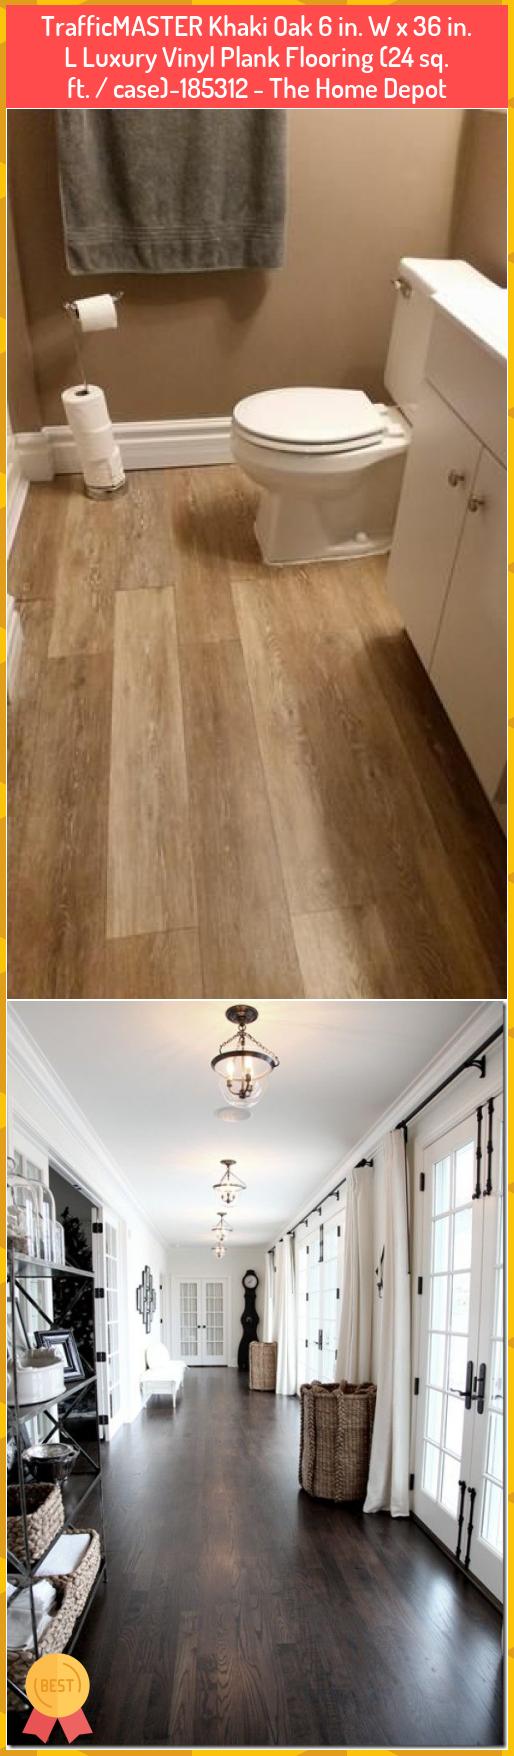 Trafficmaster Khaki Oak 6 In W X 36 In L Luxury Vinyl Plank Flooring 24 Sq Ft Case 185312 The Hom In 2020 Vinyl Plank Flooring Vinyl Plank Luxury Vinyl Plank